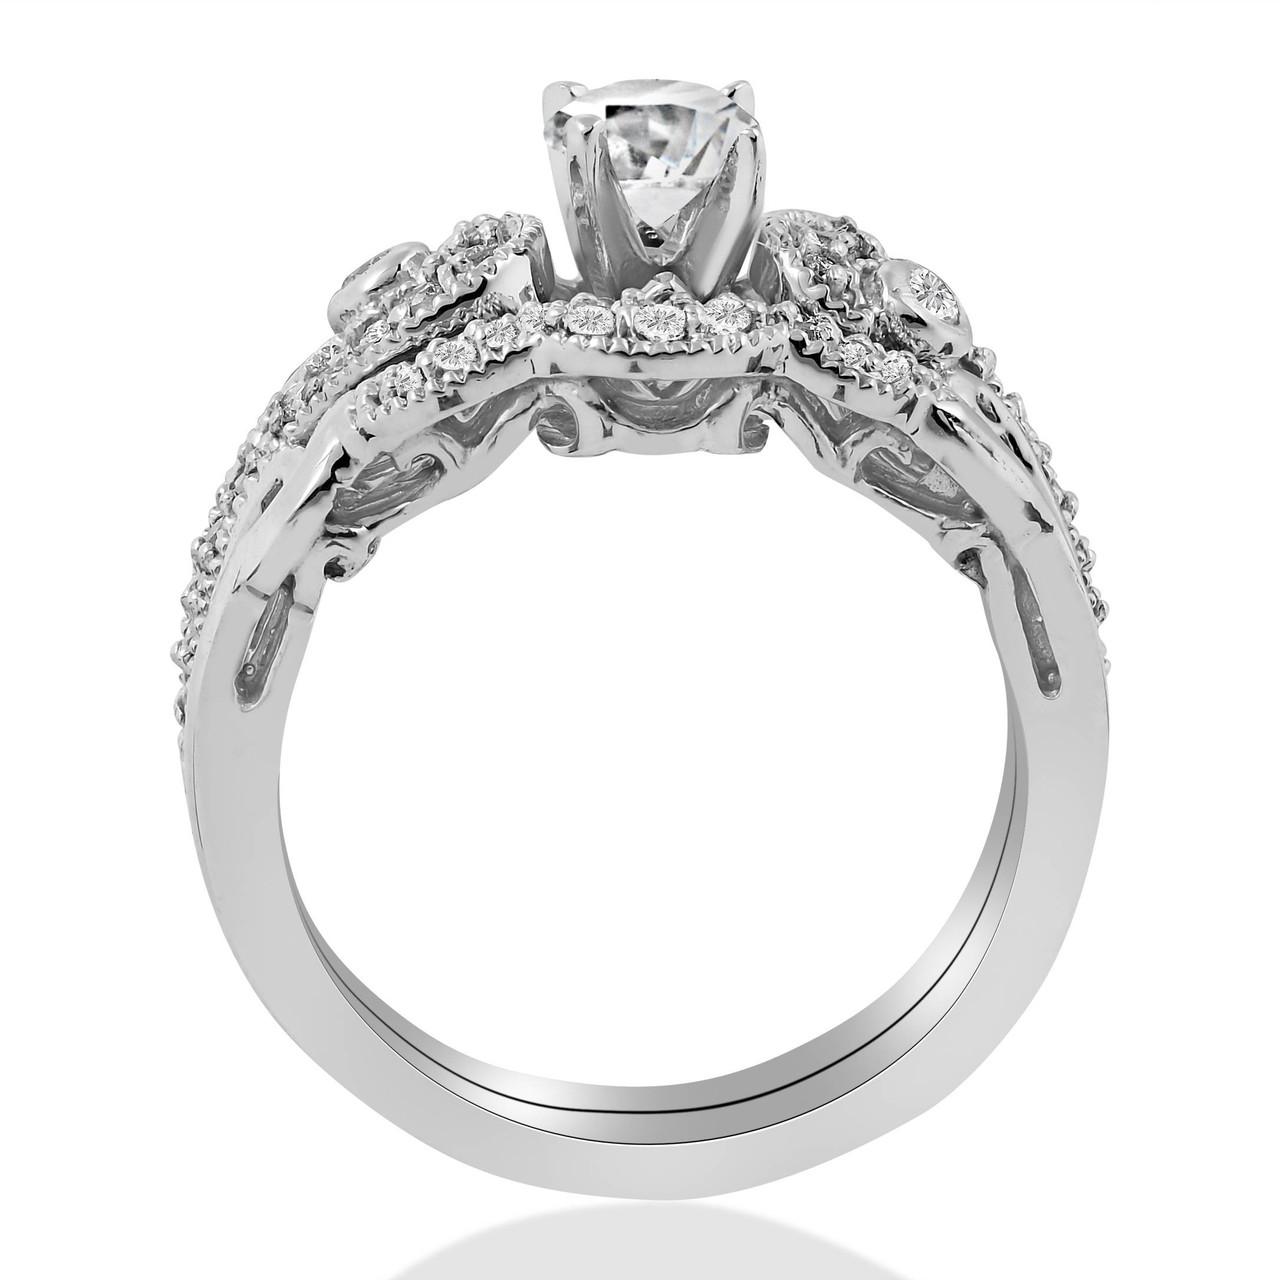 Emery 3 4ct Vintage Diamond Engagement Wedding Ring Set 14k White Gold